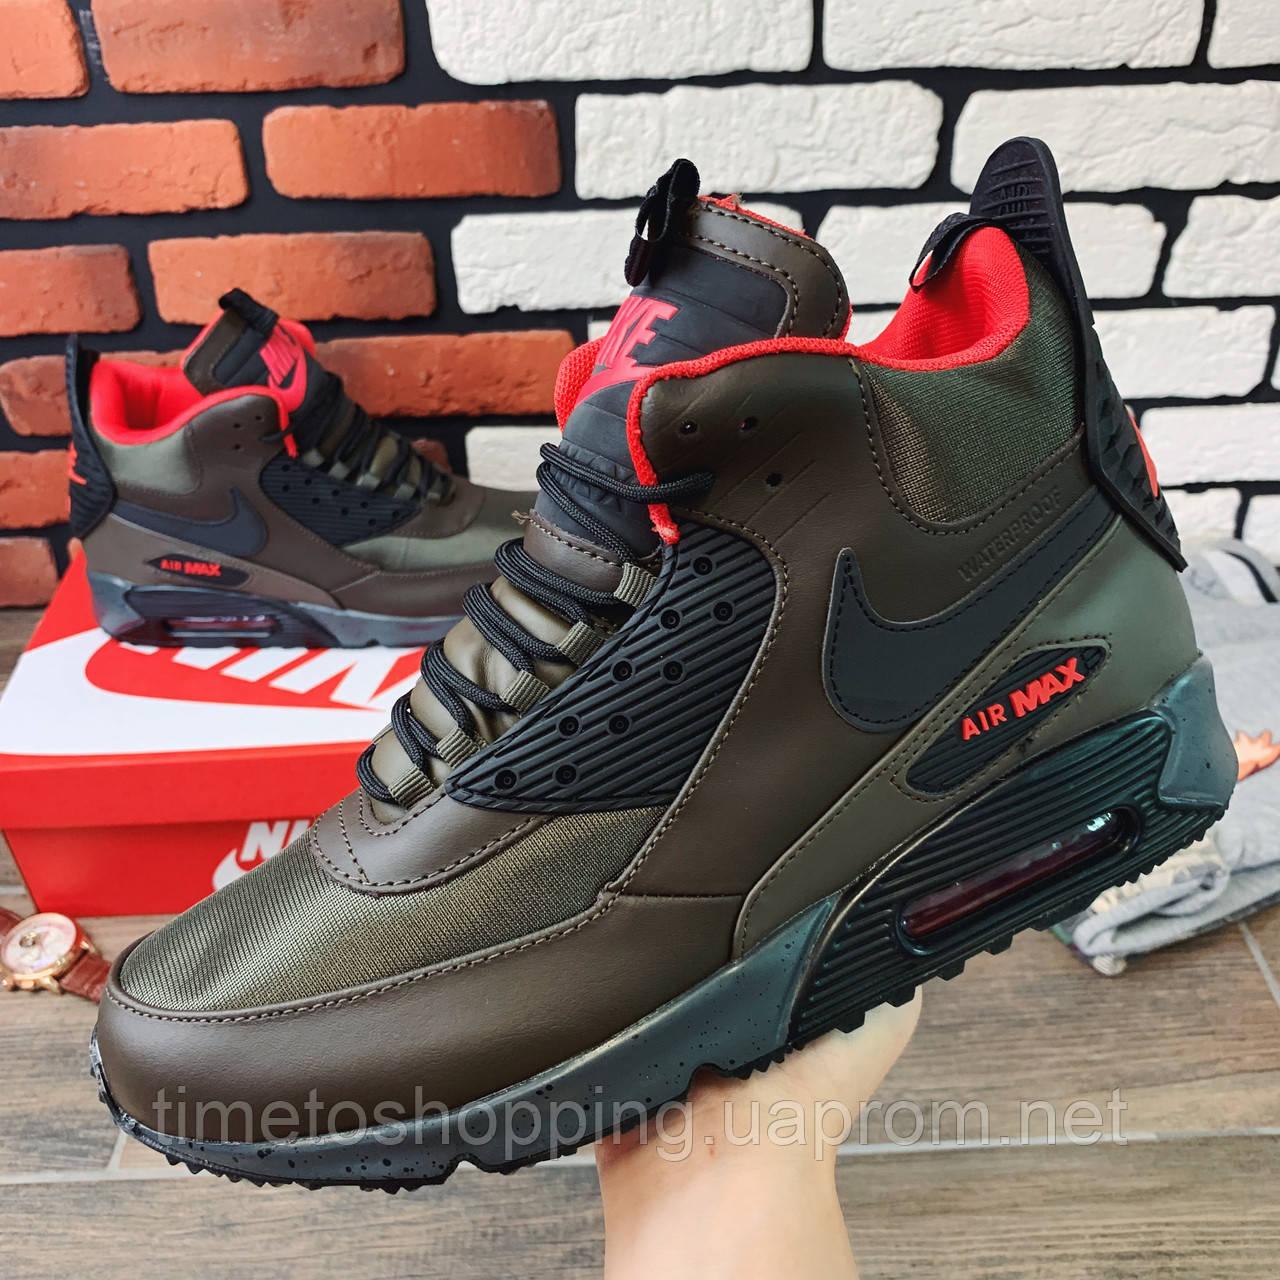 Термо-кроссовки мужские Nike Air Max  1182 ⏩ [ 41,42,43,44 ]